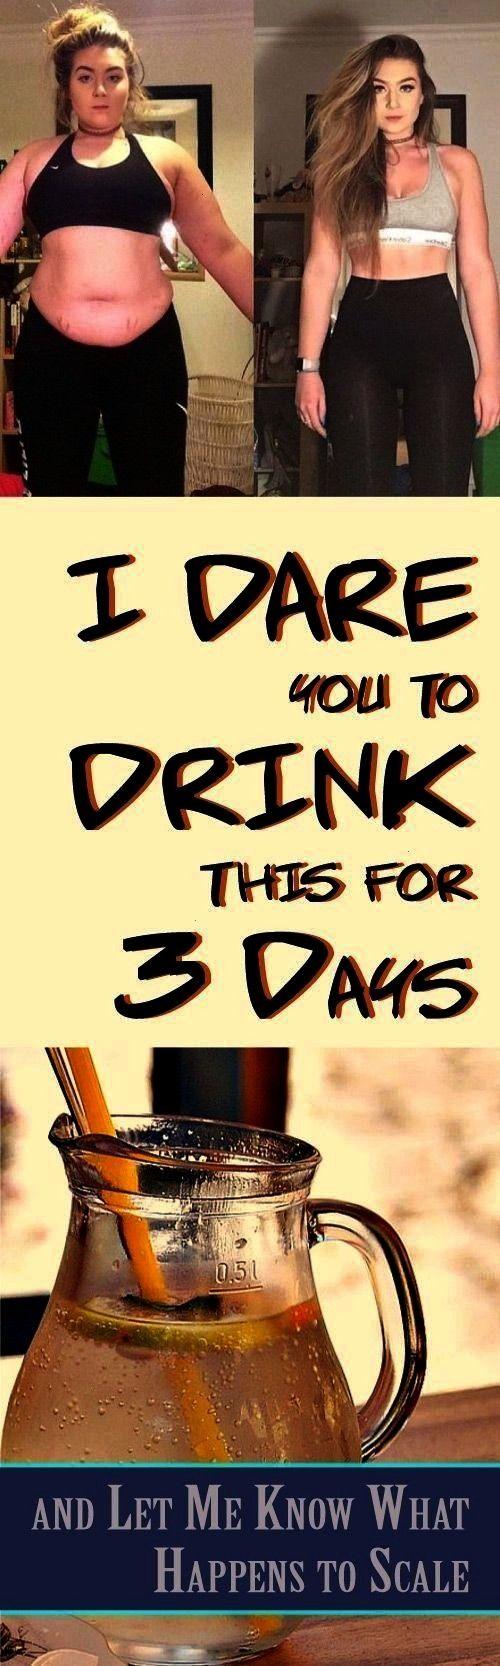 #acupressure #lifehacks #skalieren #passiert #fitness #trinken #happens #wissen #scale #drink #thisi...